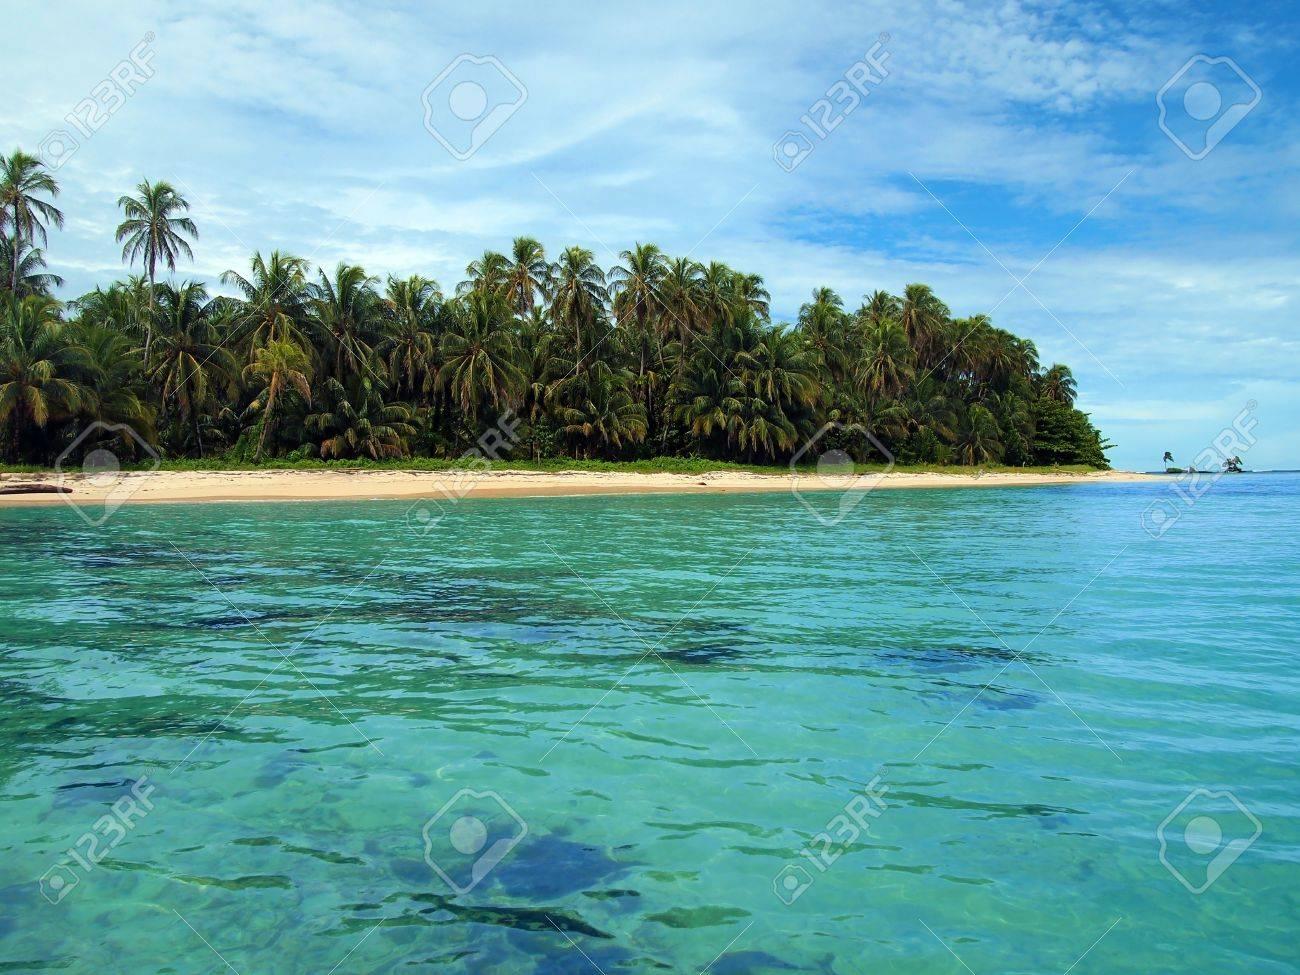 Beach in Zapatillas islands, Bocas del Toro, caribbean sea, Panama Stock Photo - 10602418